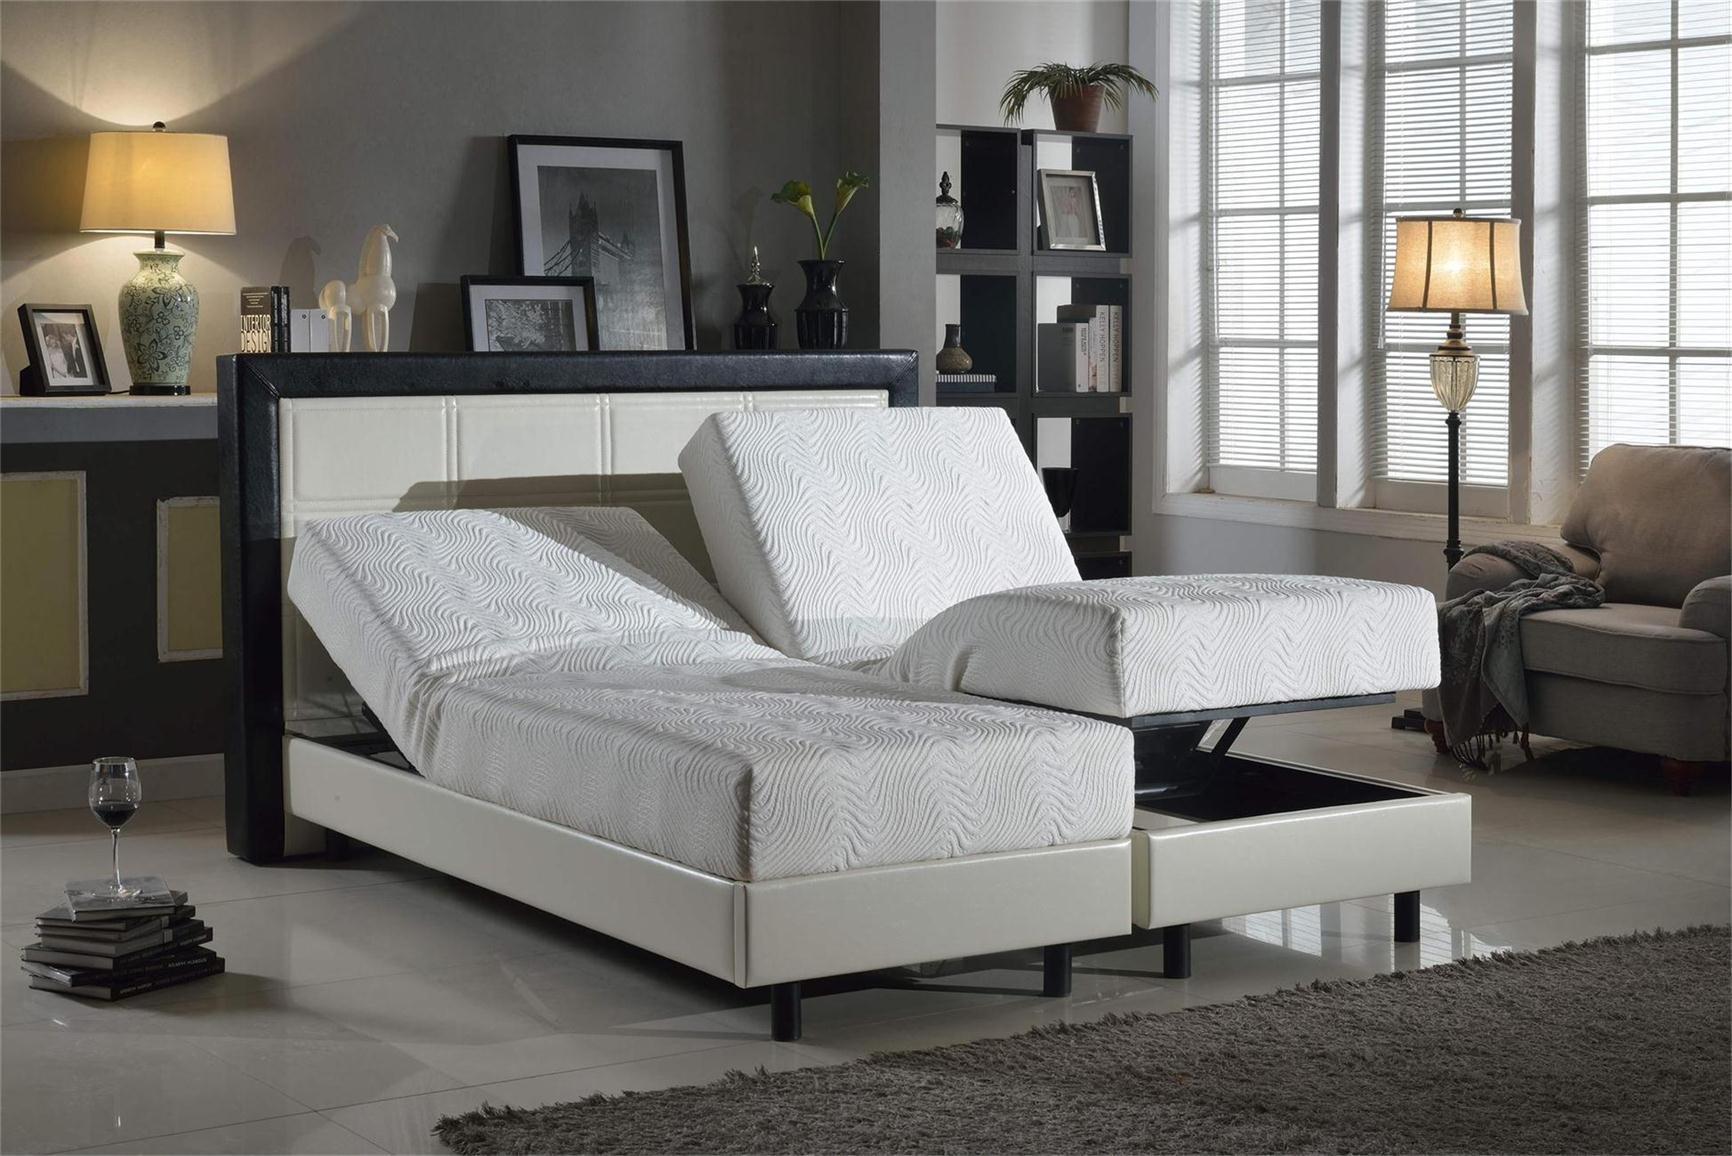 Modern PU Hotel Popular Storage White Home Bedroom Furniture